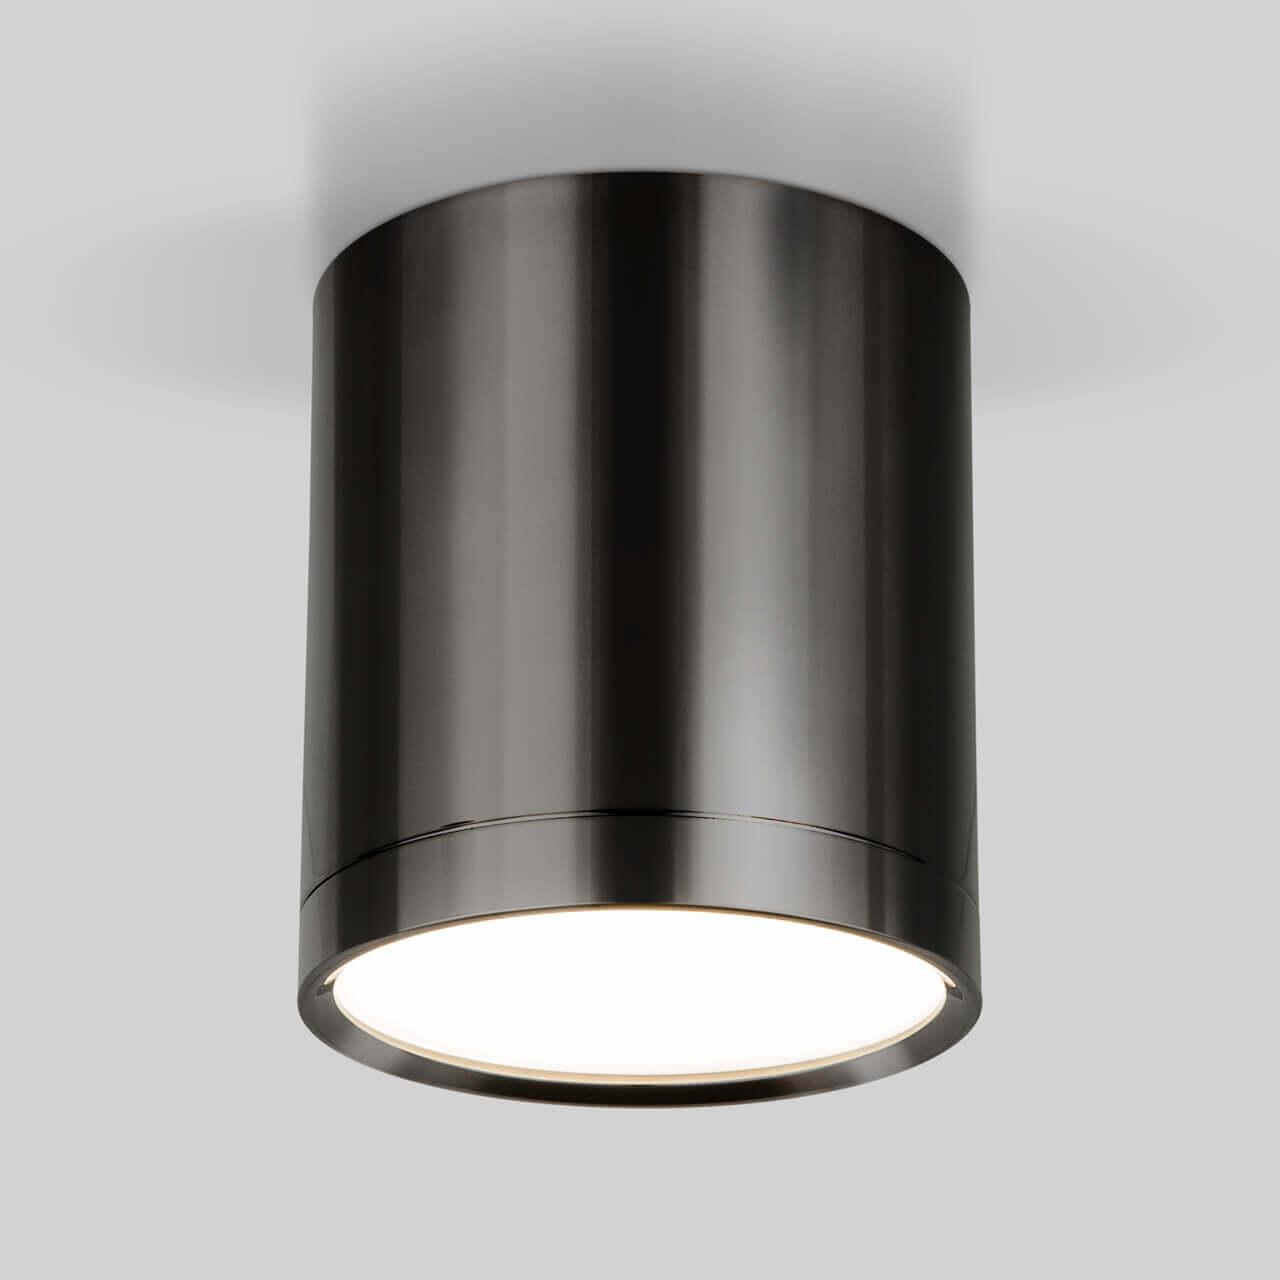 Светильник Elektrostandard 4690389167706 DLR024 DL